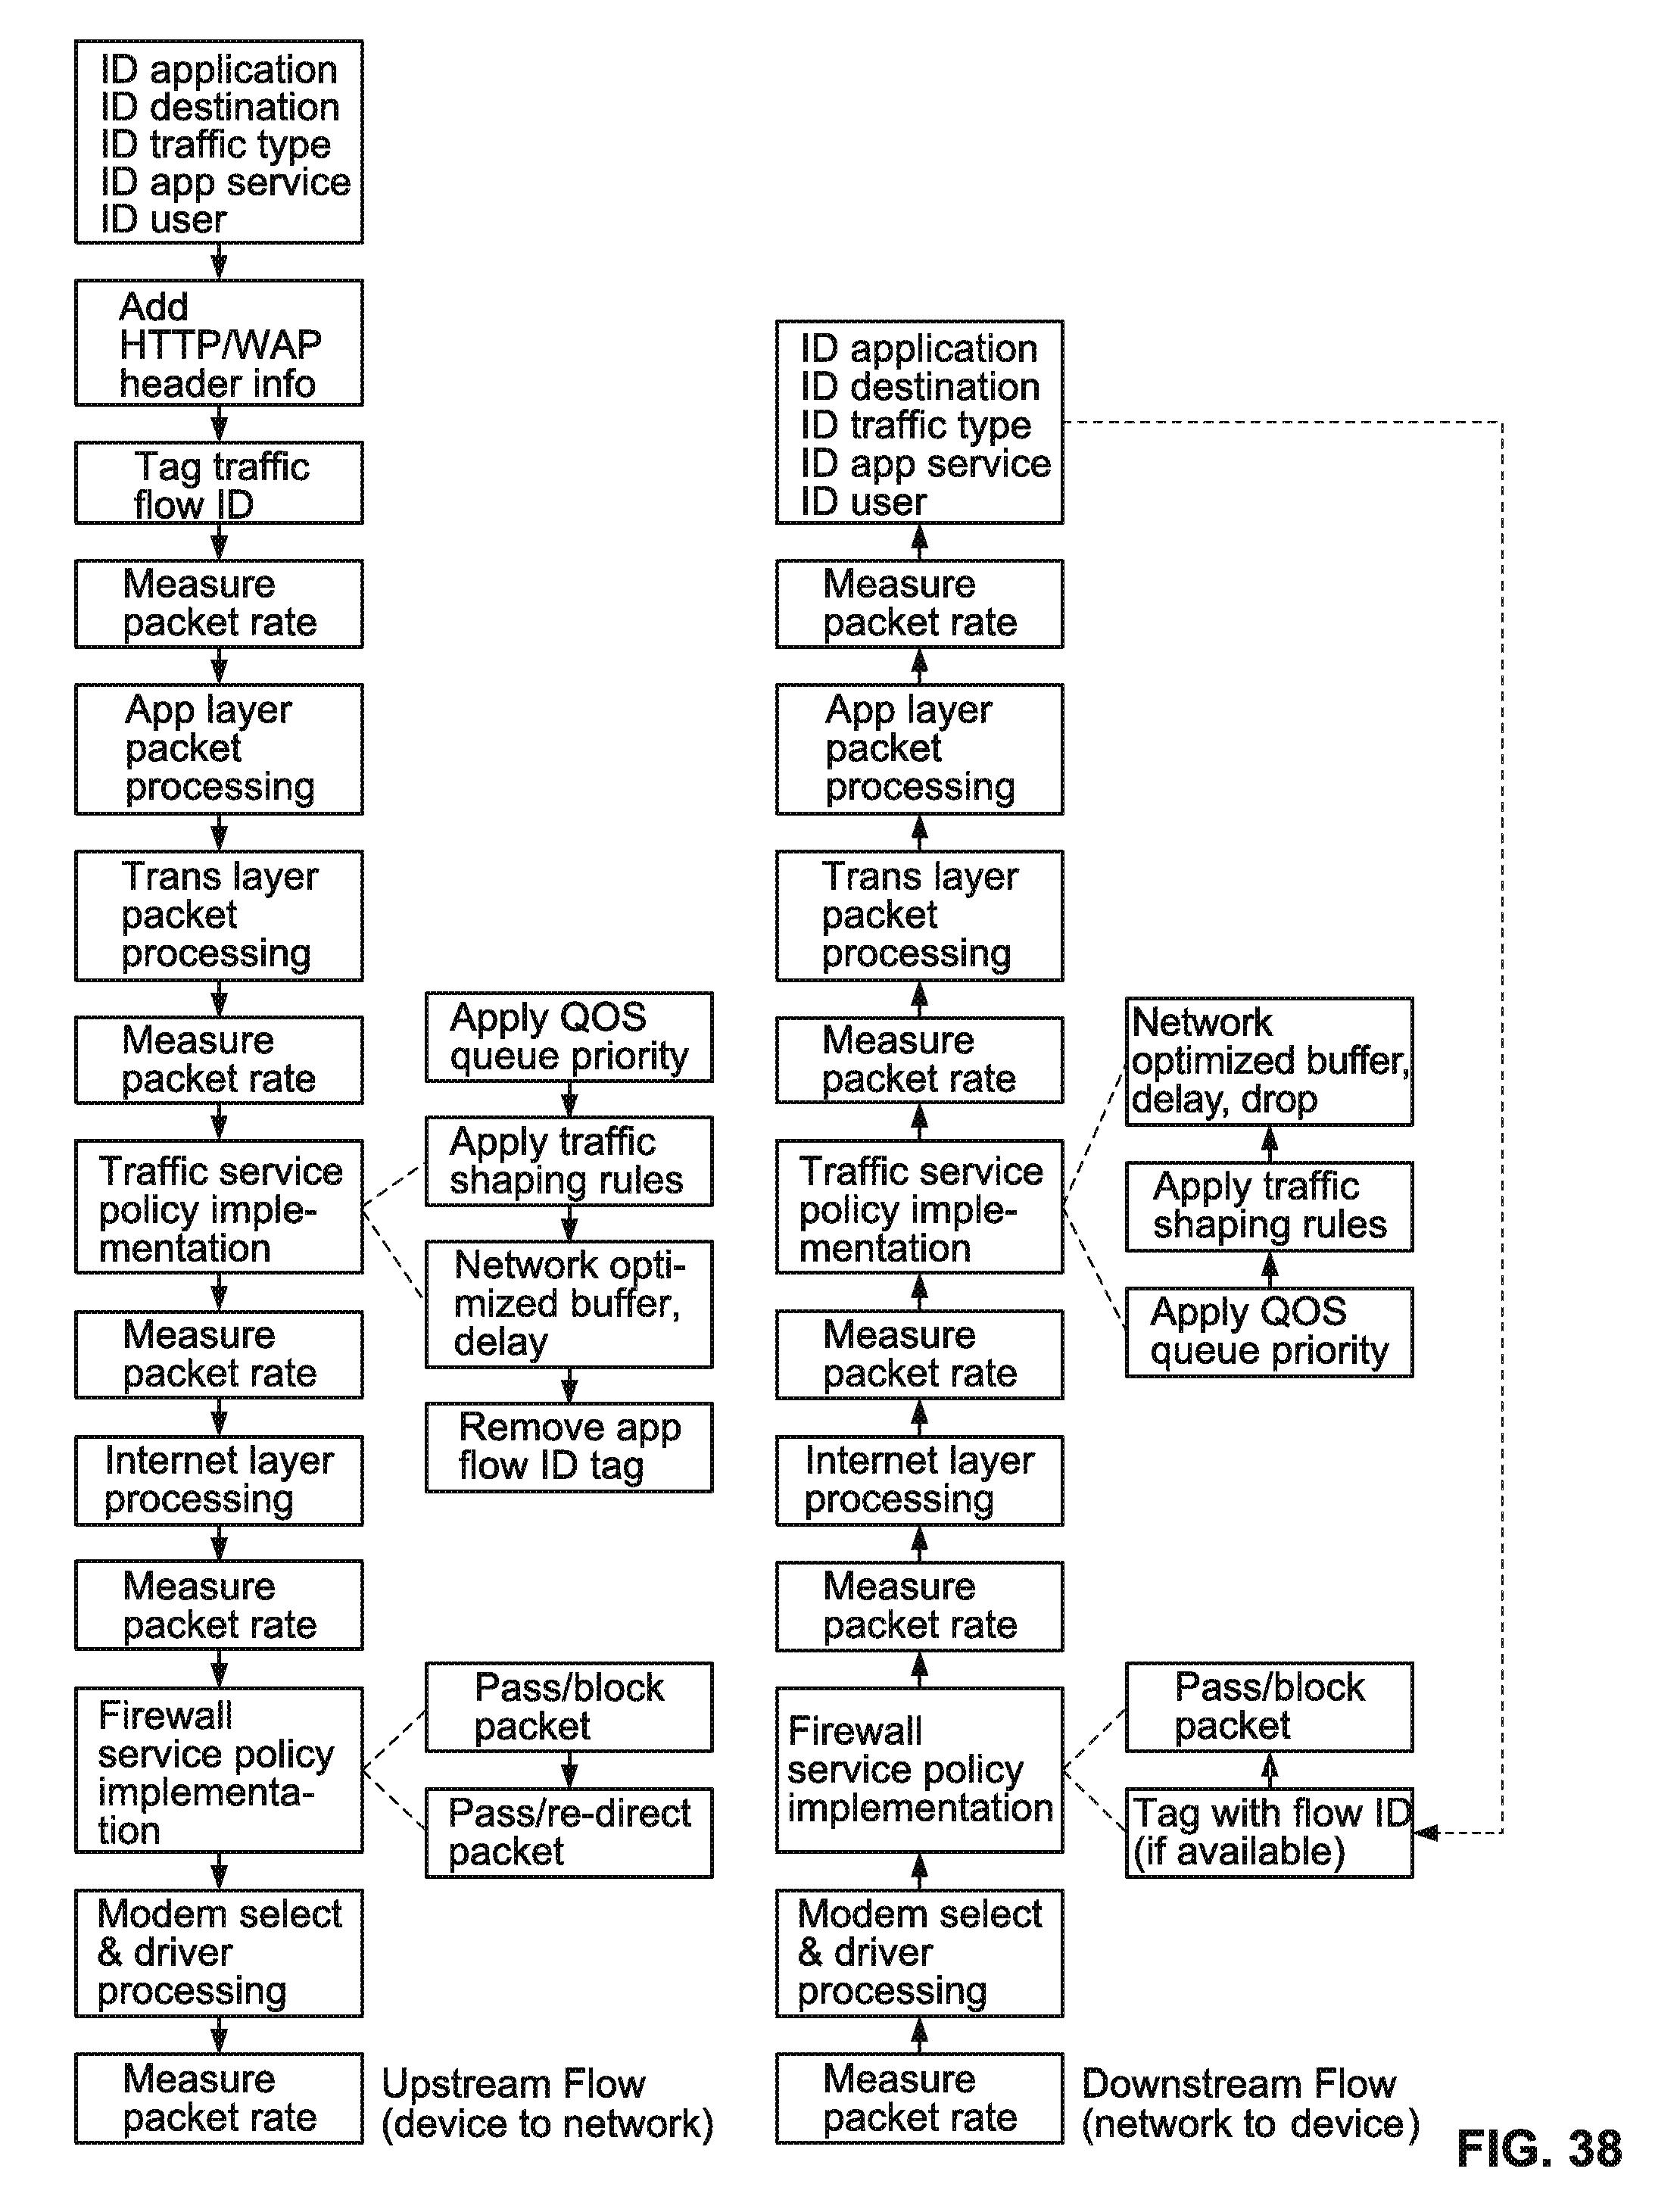 Patent US 9,179,315 B2